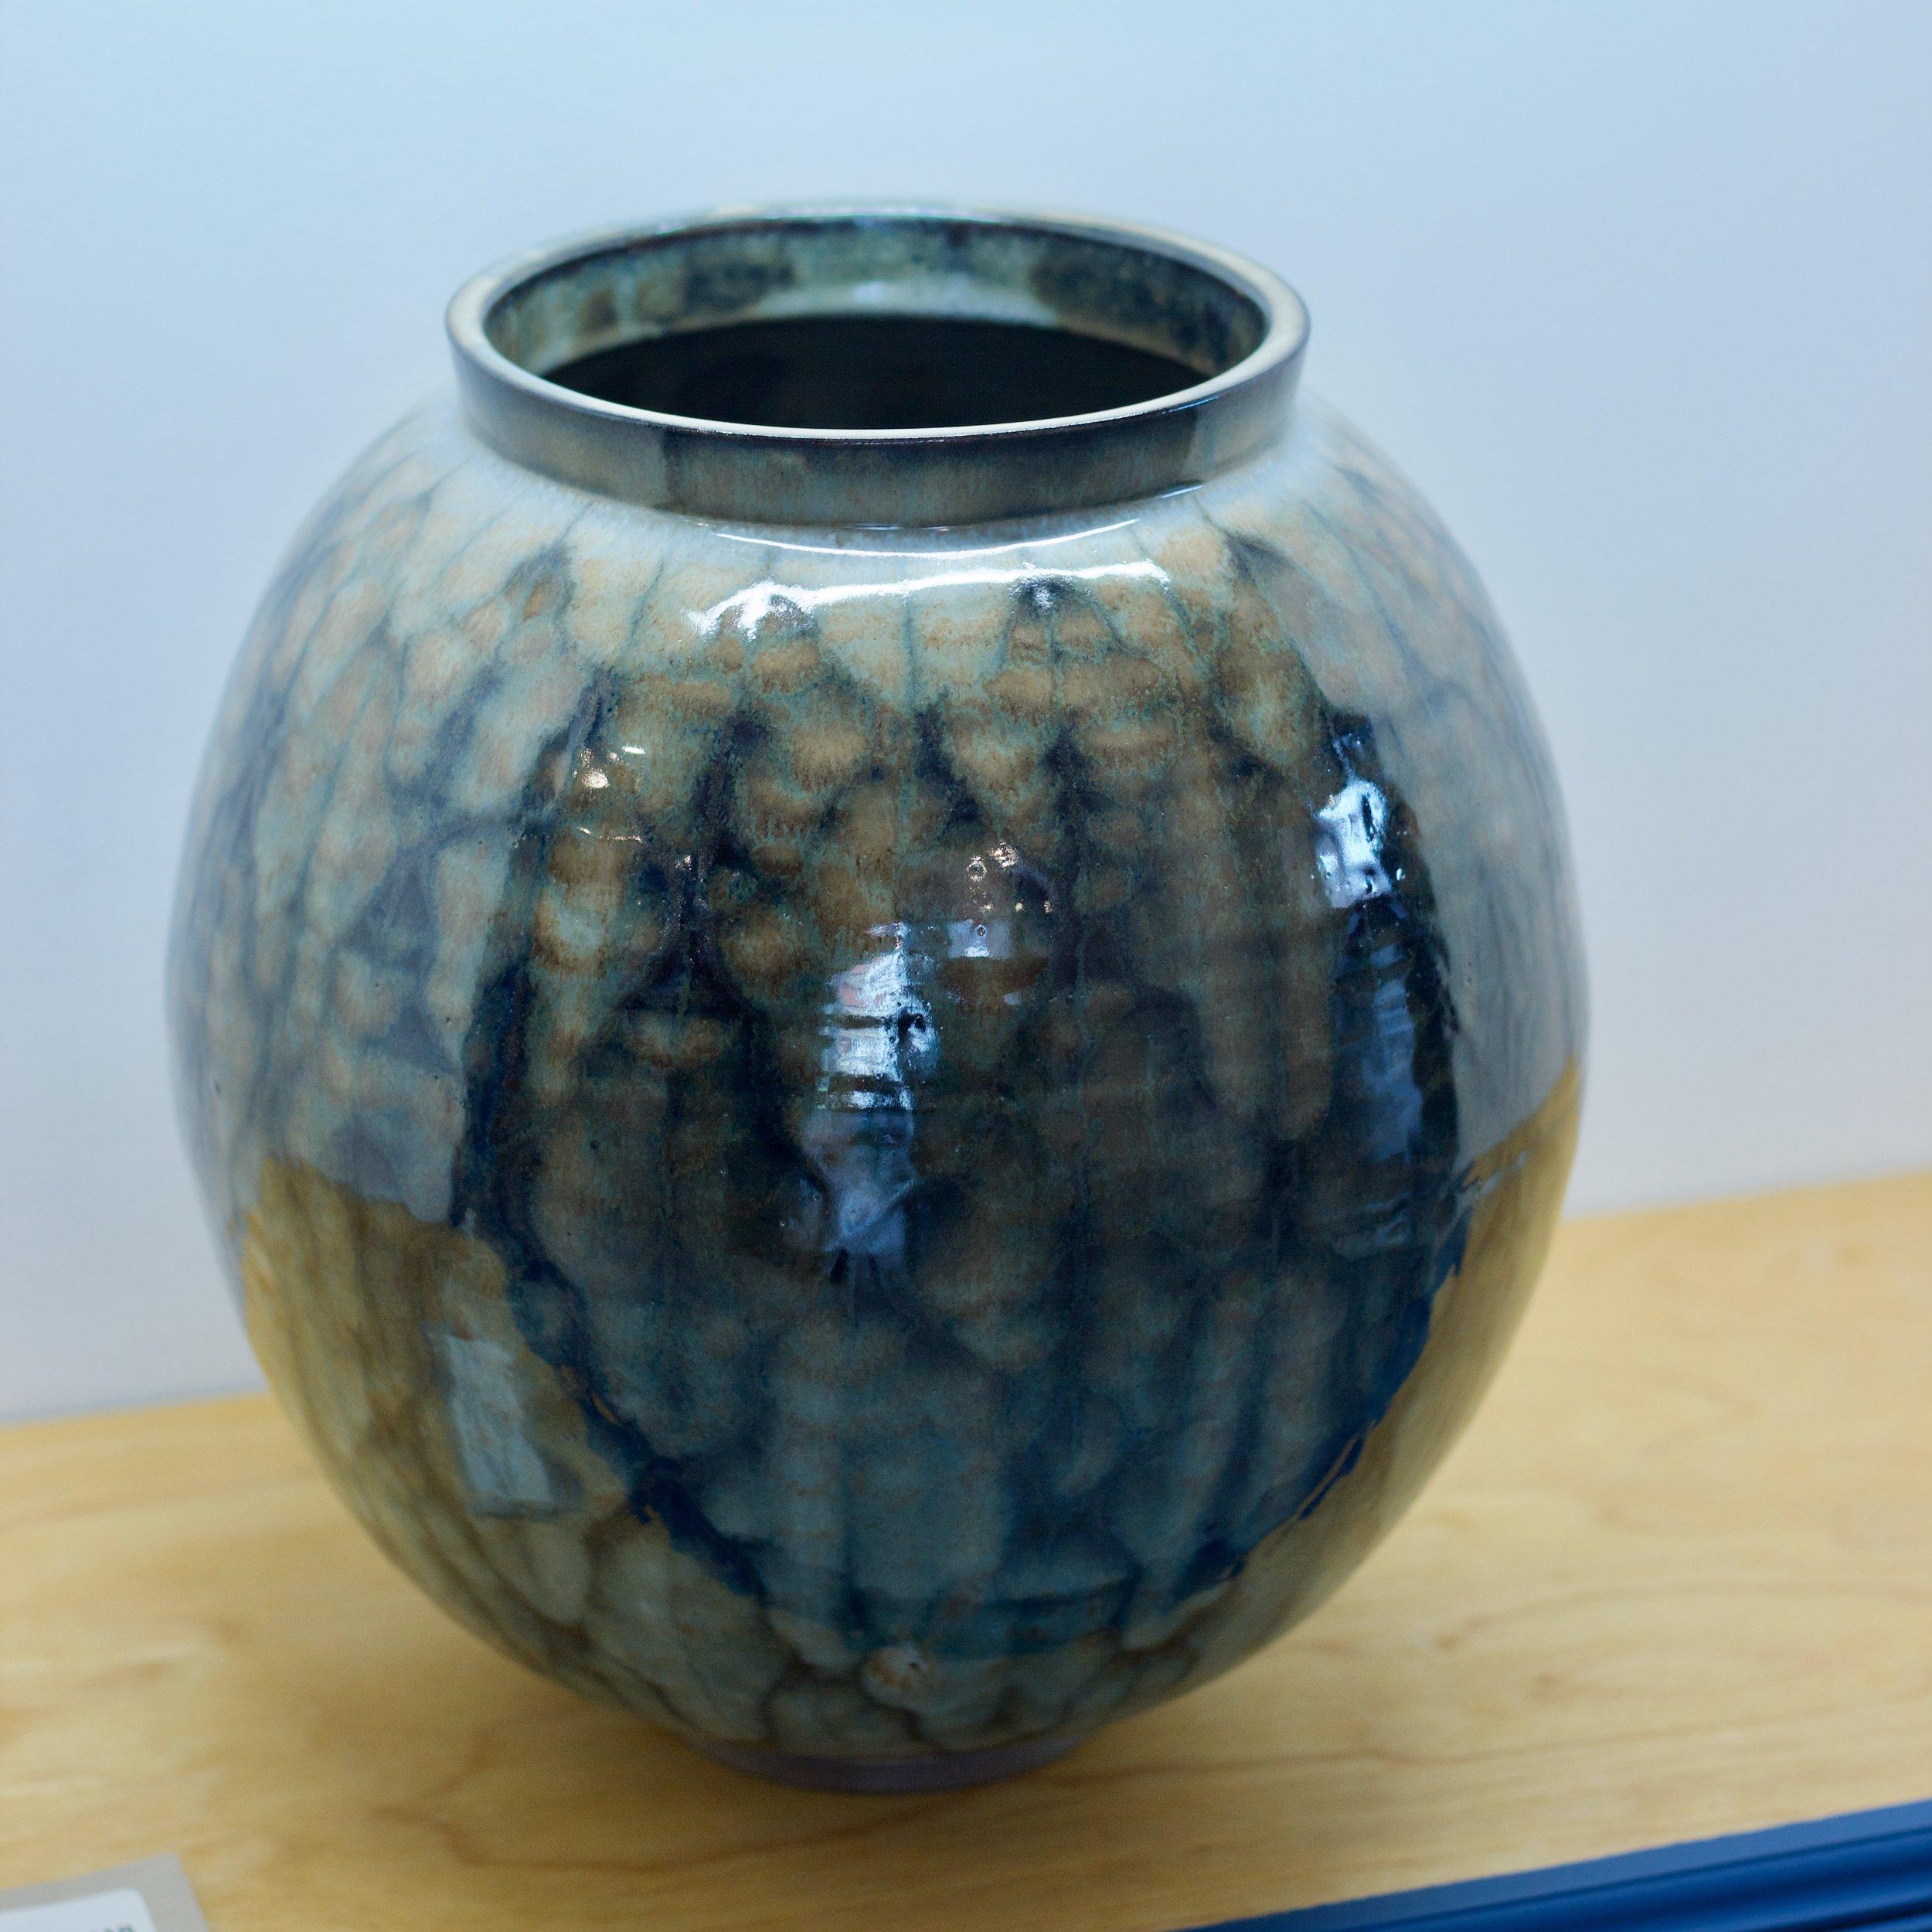 Symy Ong - Moon Jar